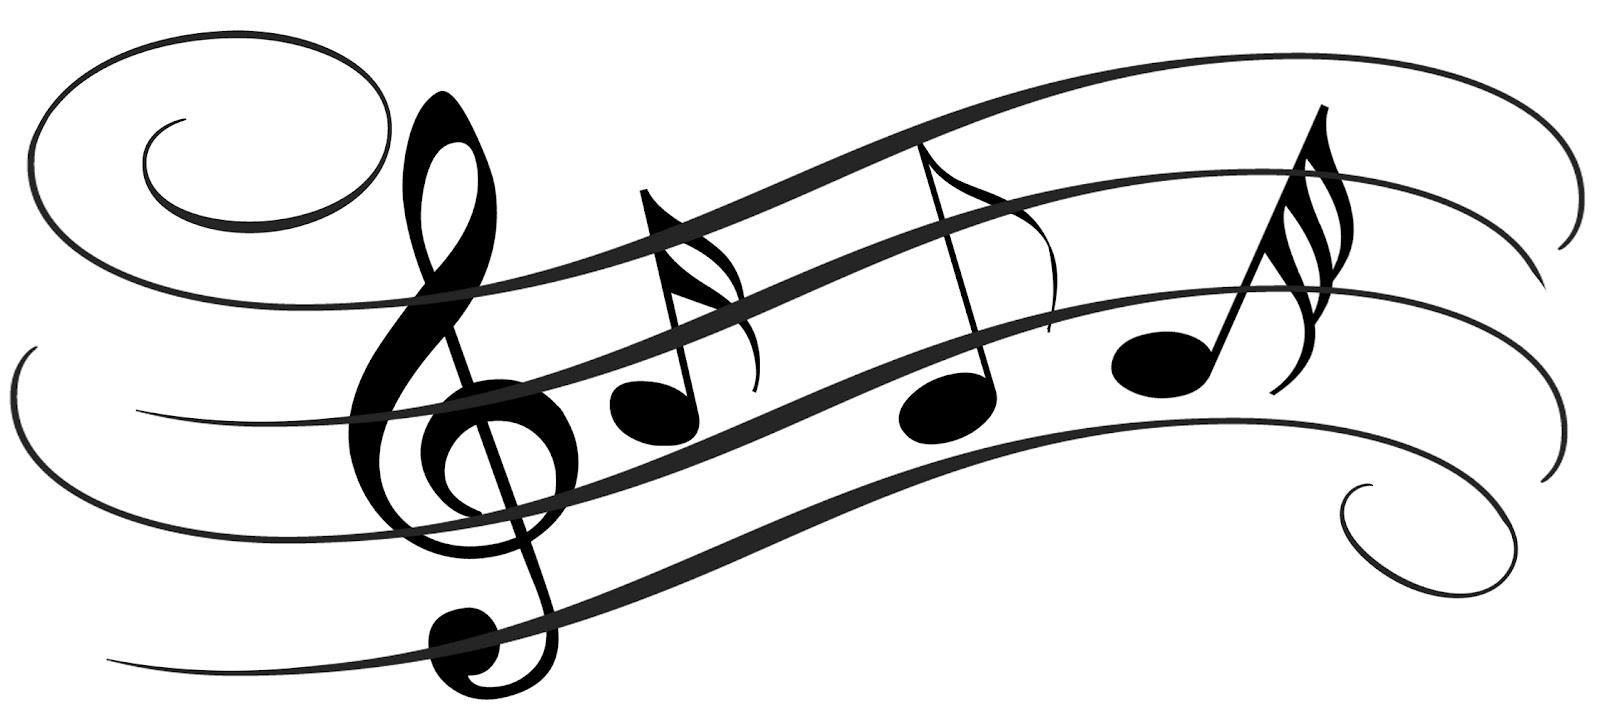 Clip Art Music Notes Clip Art Music Note-Clip Art Music Notes Clip Art music notes clipart for walls clipartfox pinterest notes-14